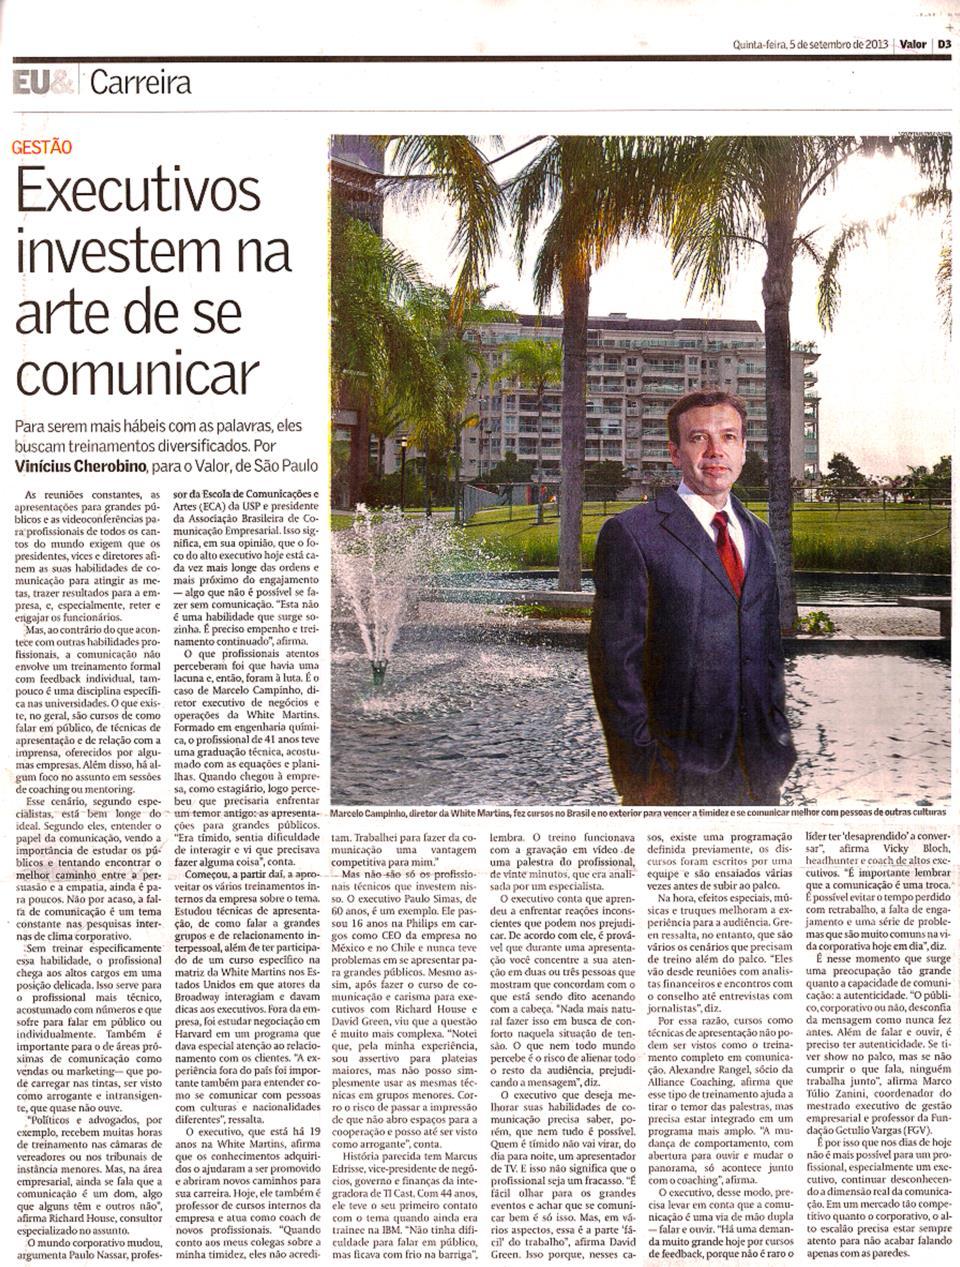 20130905 - Valor Brazil - article